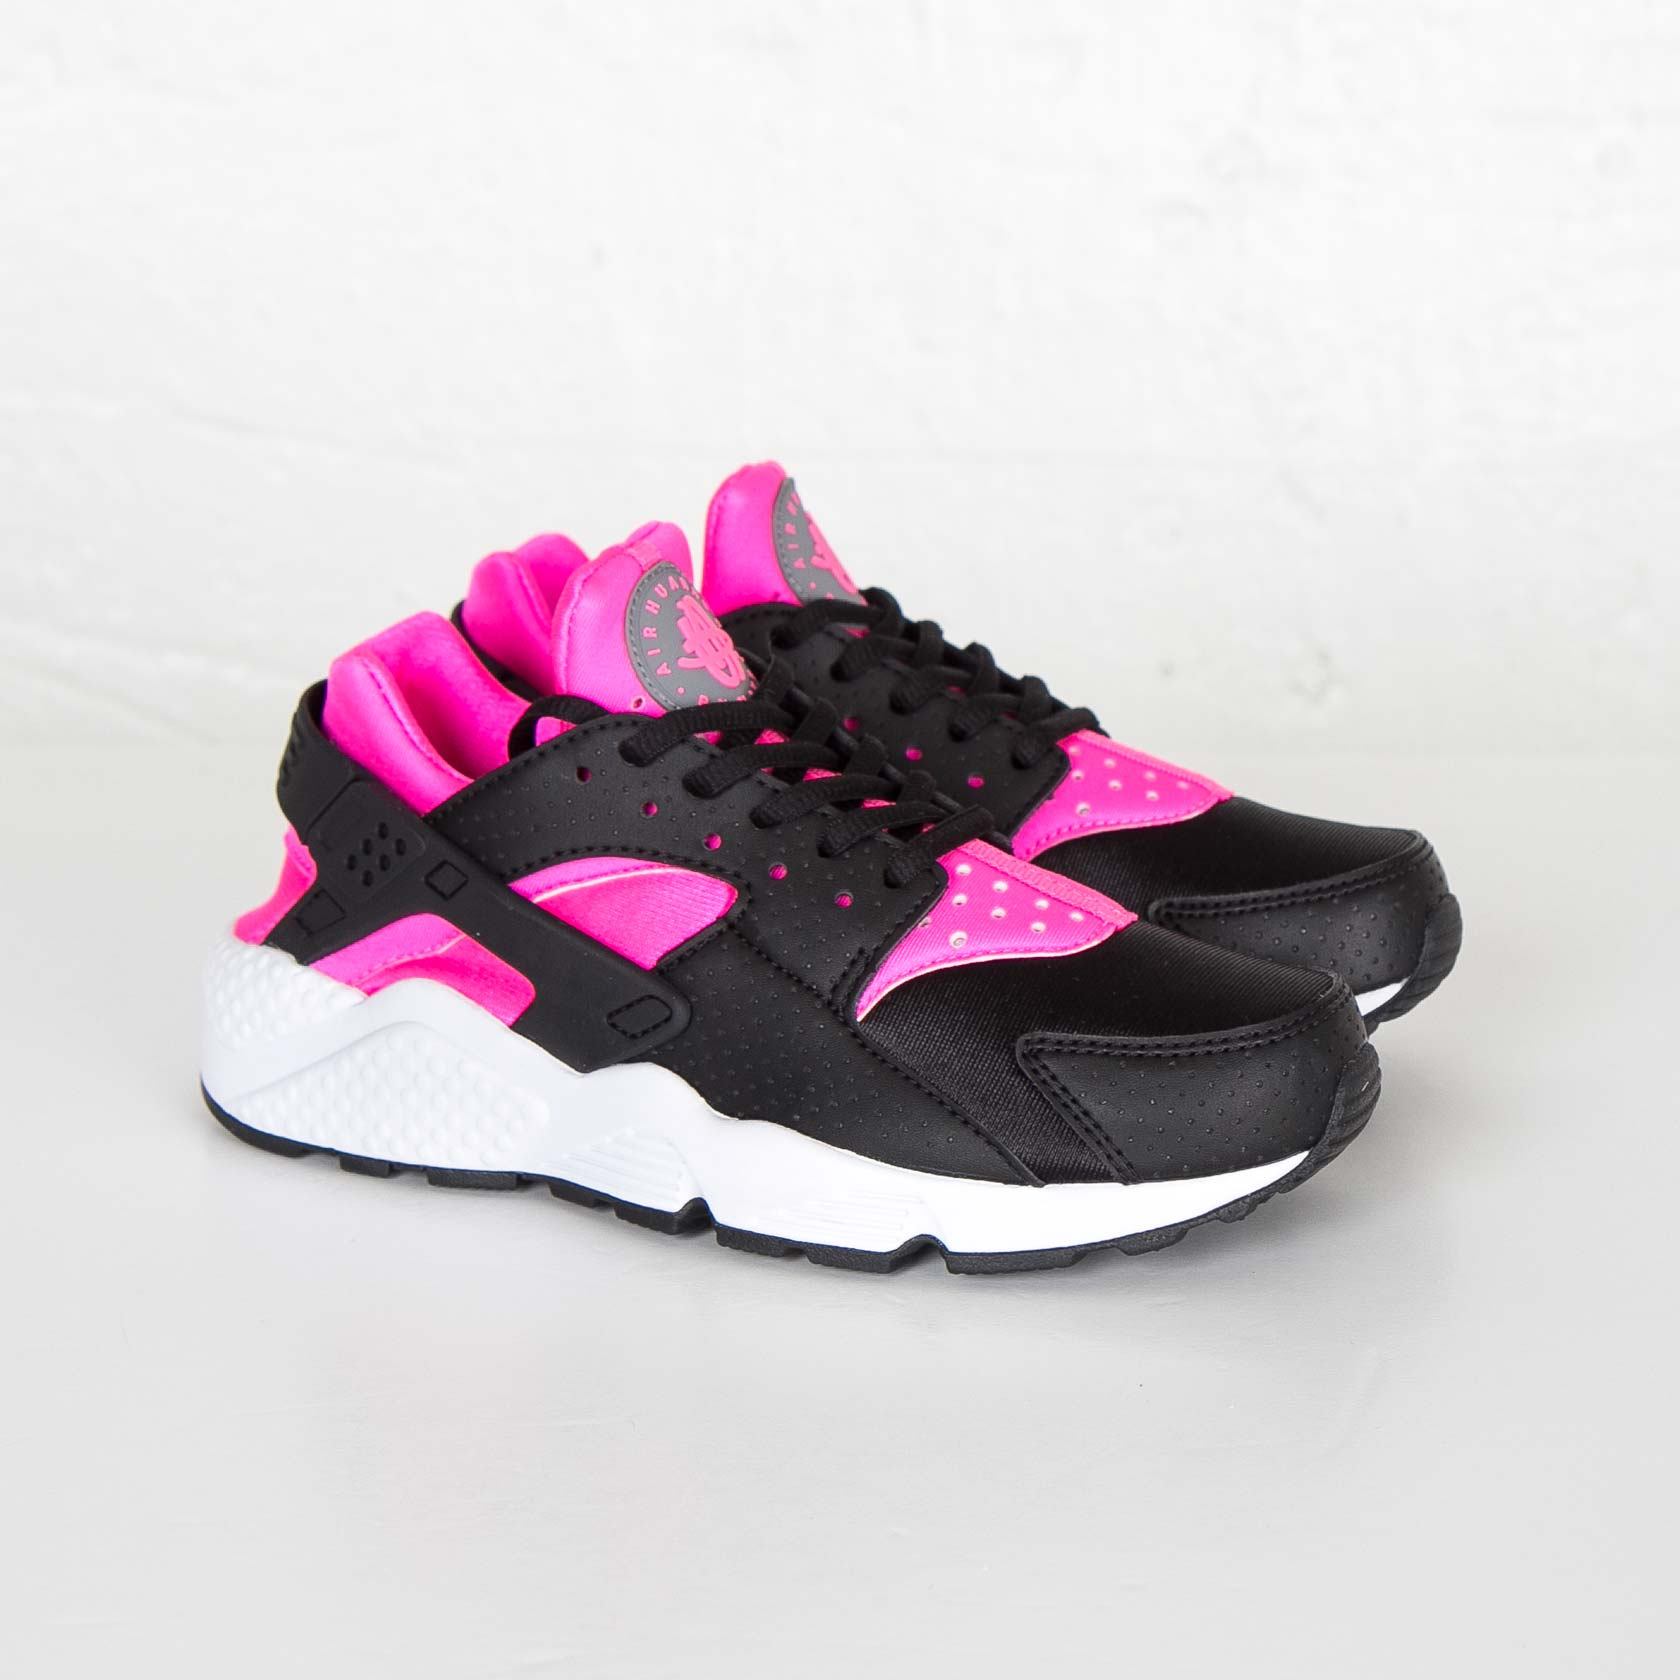 pretty nice e7168 65ff7 Nike Femme Air Huarache Huarache Huarache Run 634835 604 Basketsnstuff  Baskets 0614e9